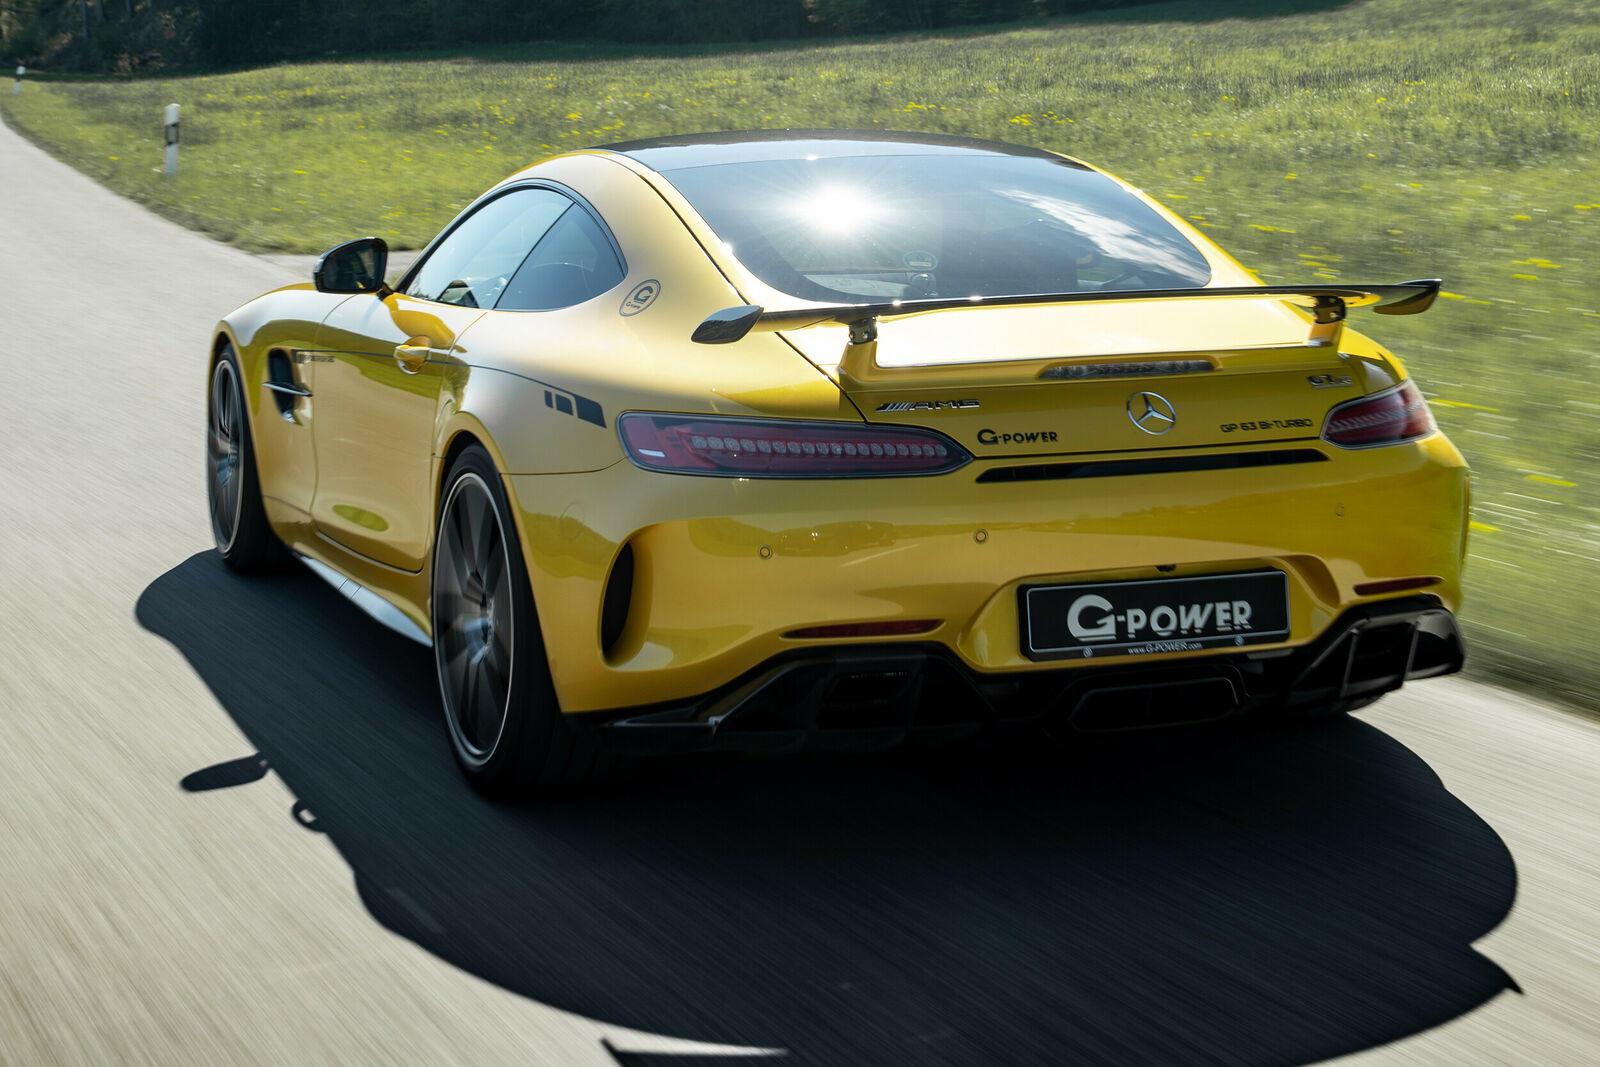 Mercedes-AMG GT R de la G-Power - Mercedes-AMG GT R de la G-Power